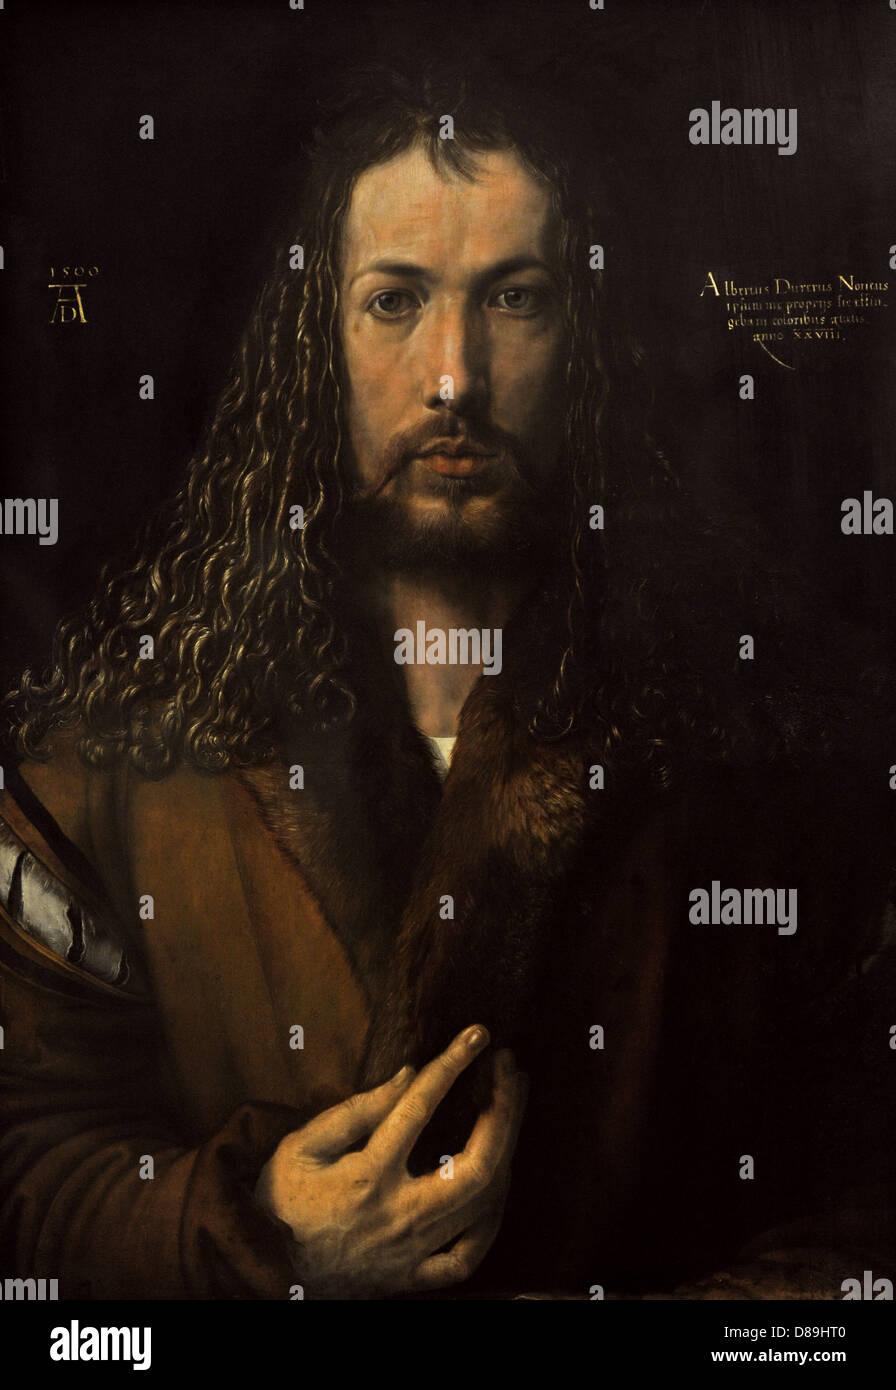 Albrecht Durer ((1471 – 1528) German painter. Self-Portrait (1500). Alte Pinakothek. Munich. Germany. - Stock Image